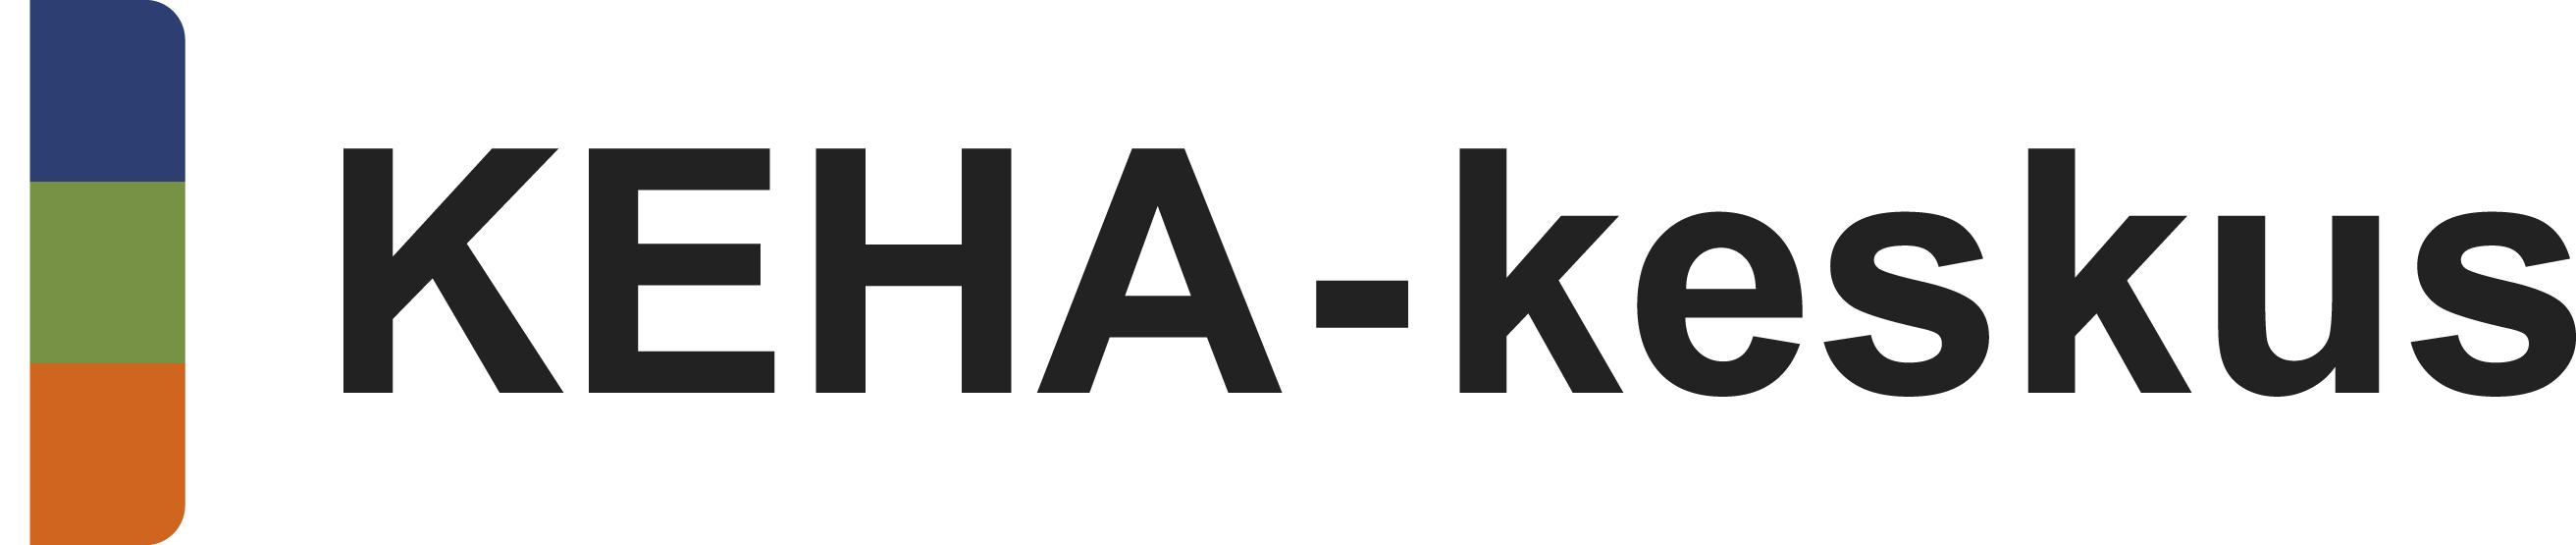 KEHA logo